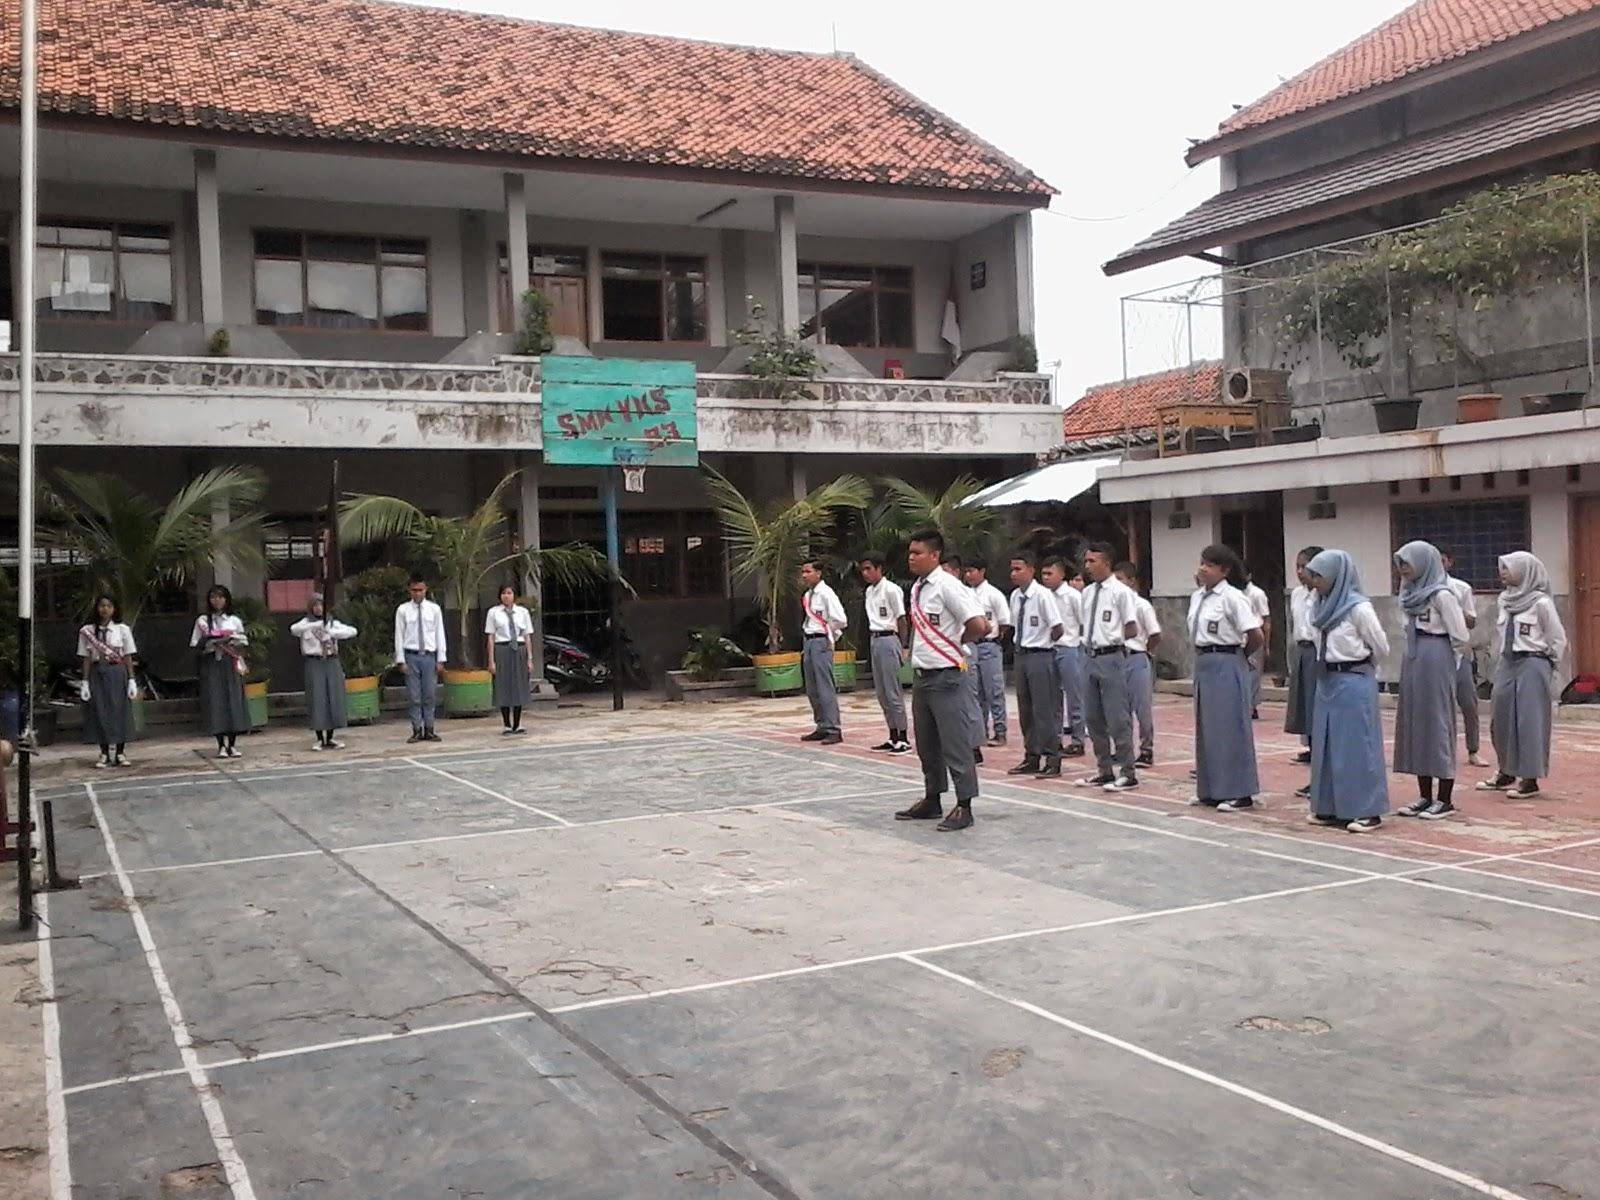 Pembukaan LDKS SMK Prabu Sakti 2 Purwakarta Tahun 2014